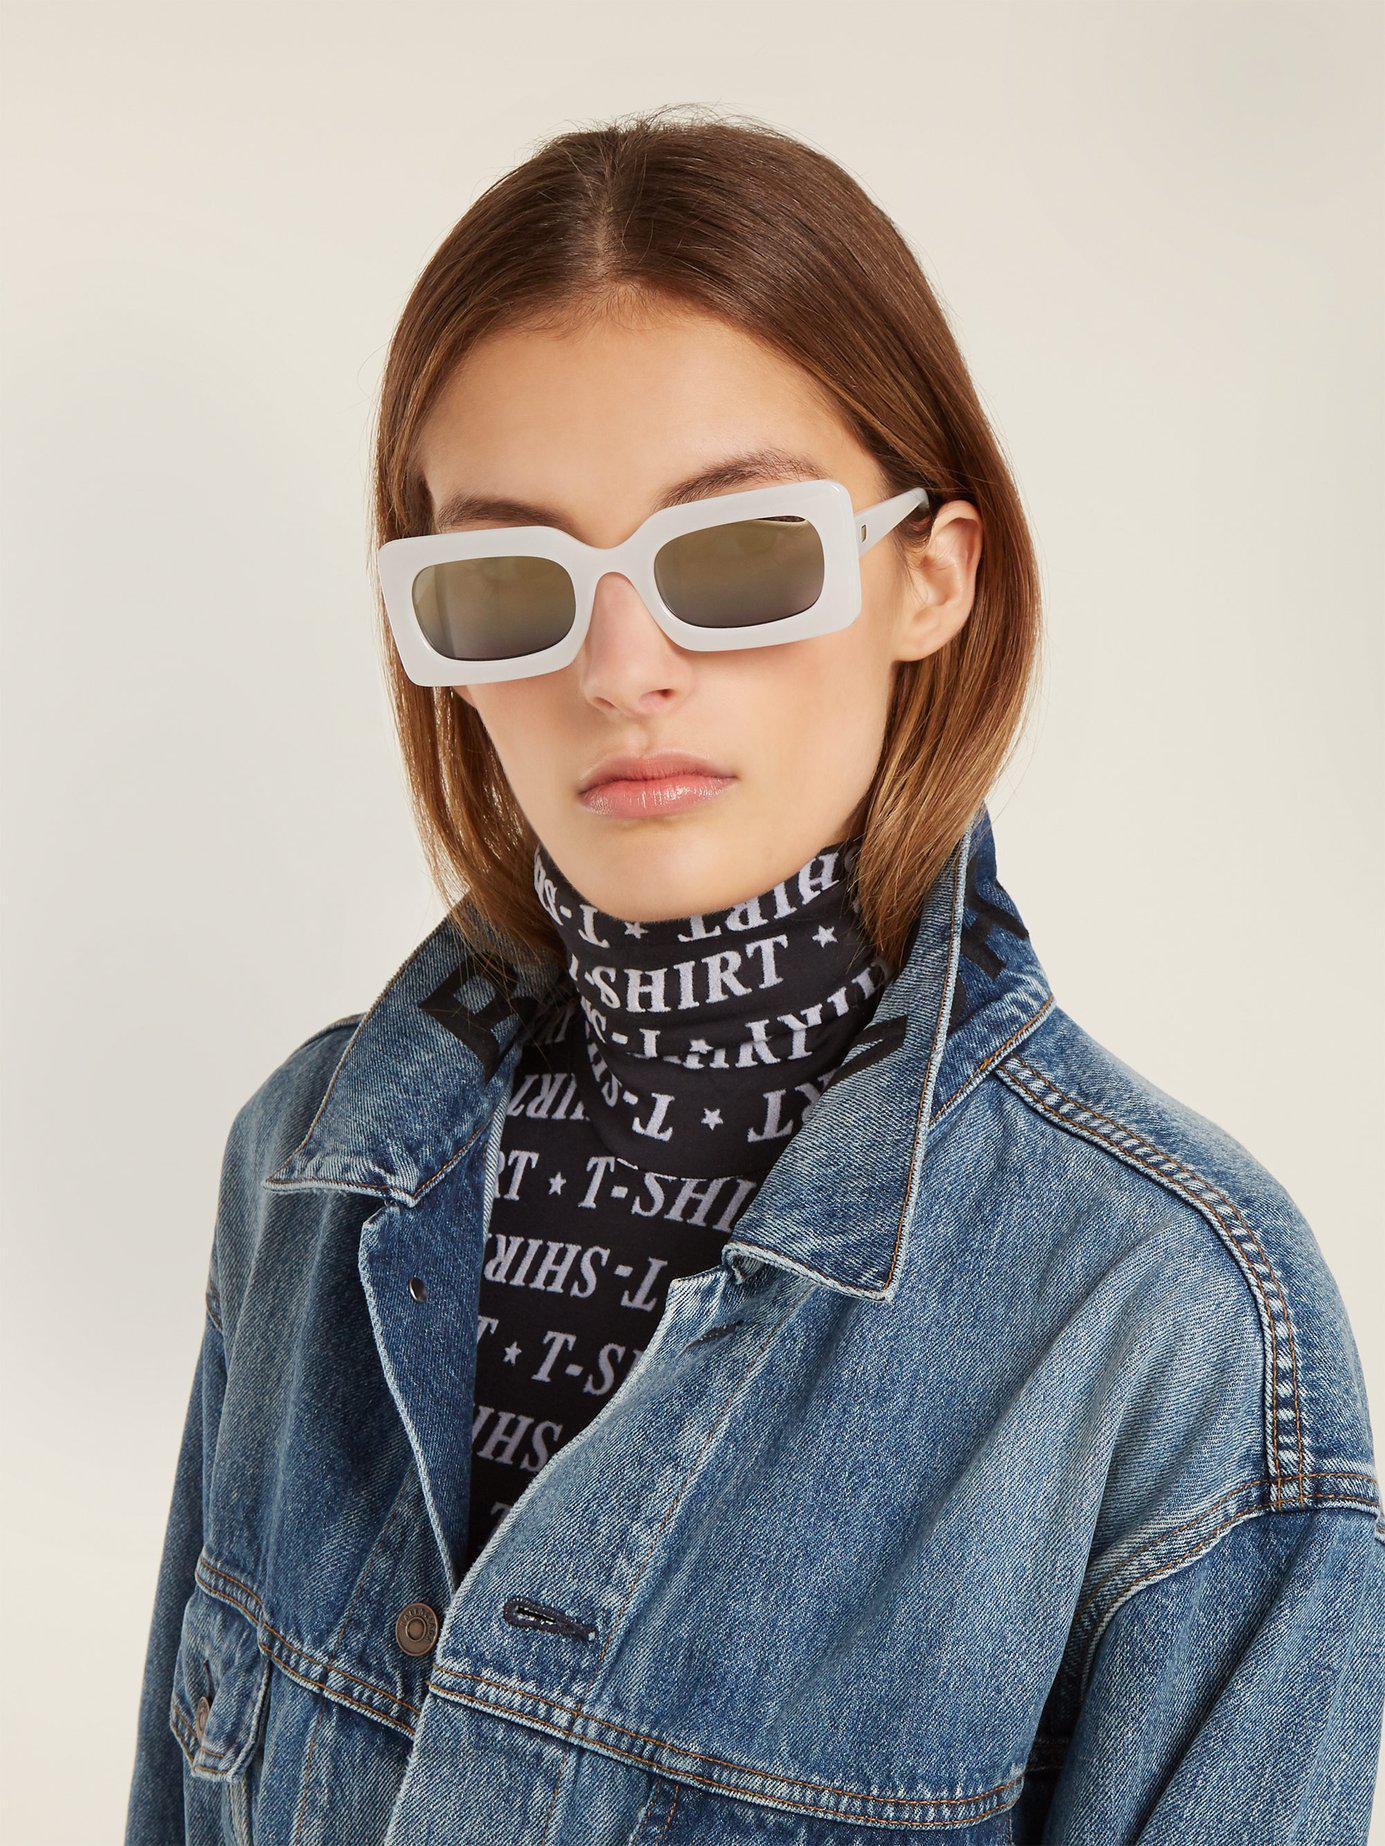 Sunglasses Specs Le DamnRectangle Acetate Frame White qSUGzpMV